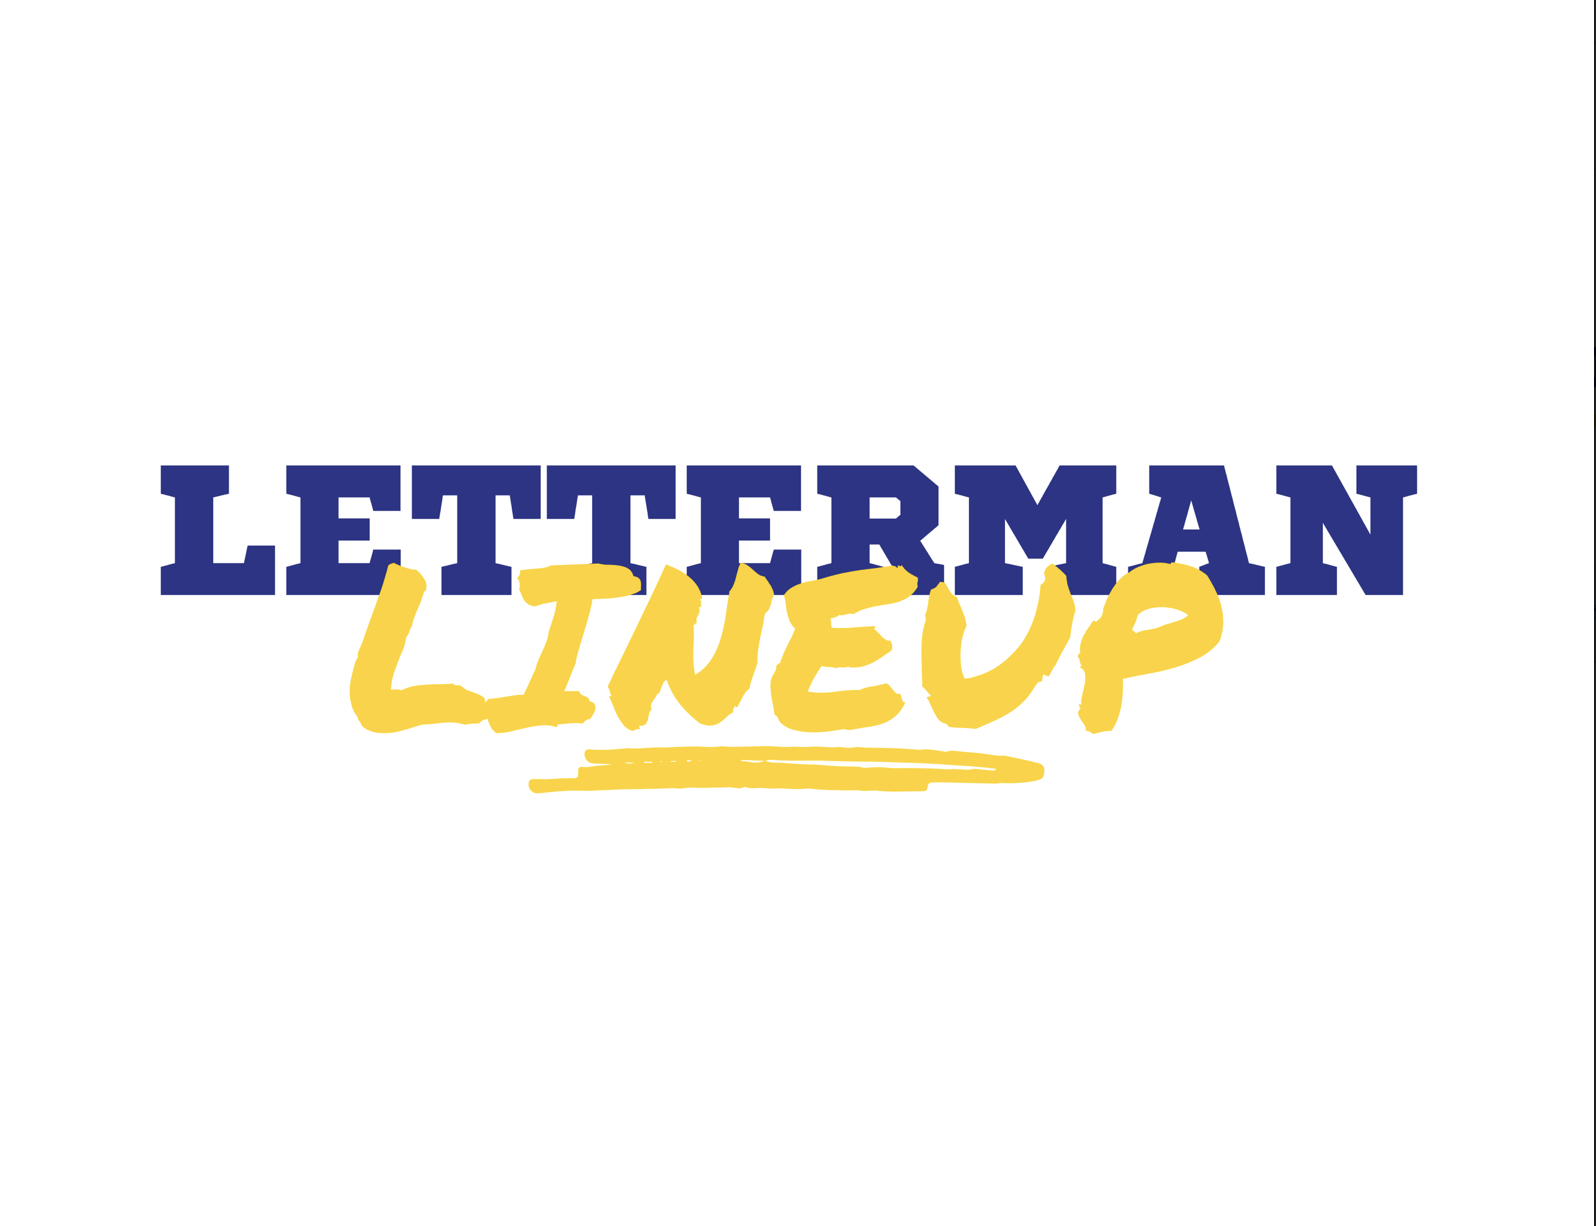 Letterman Lineup